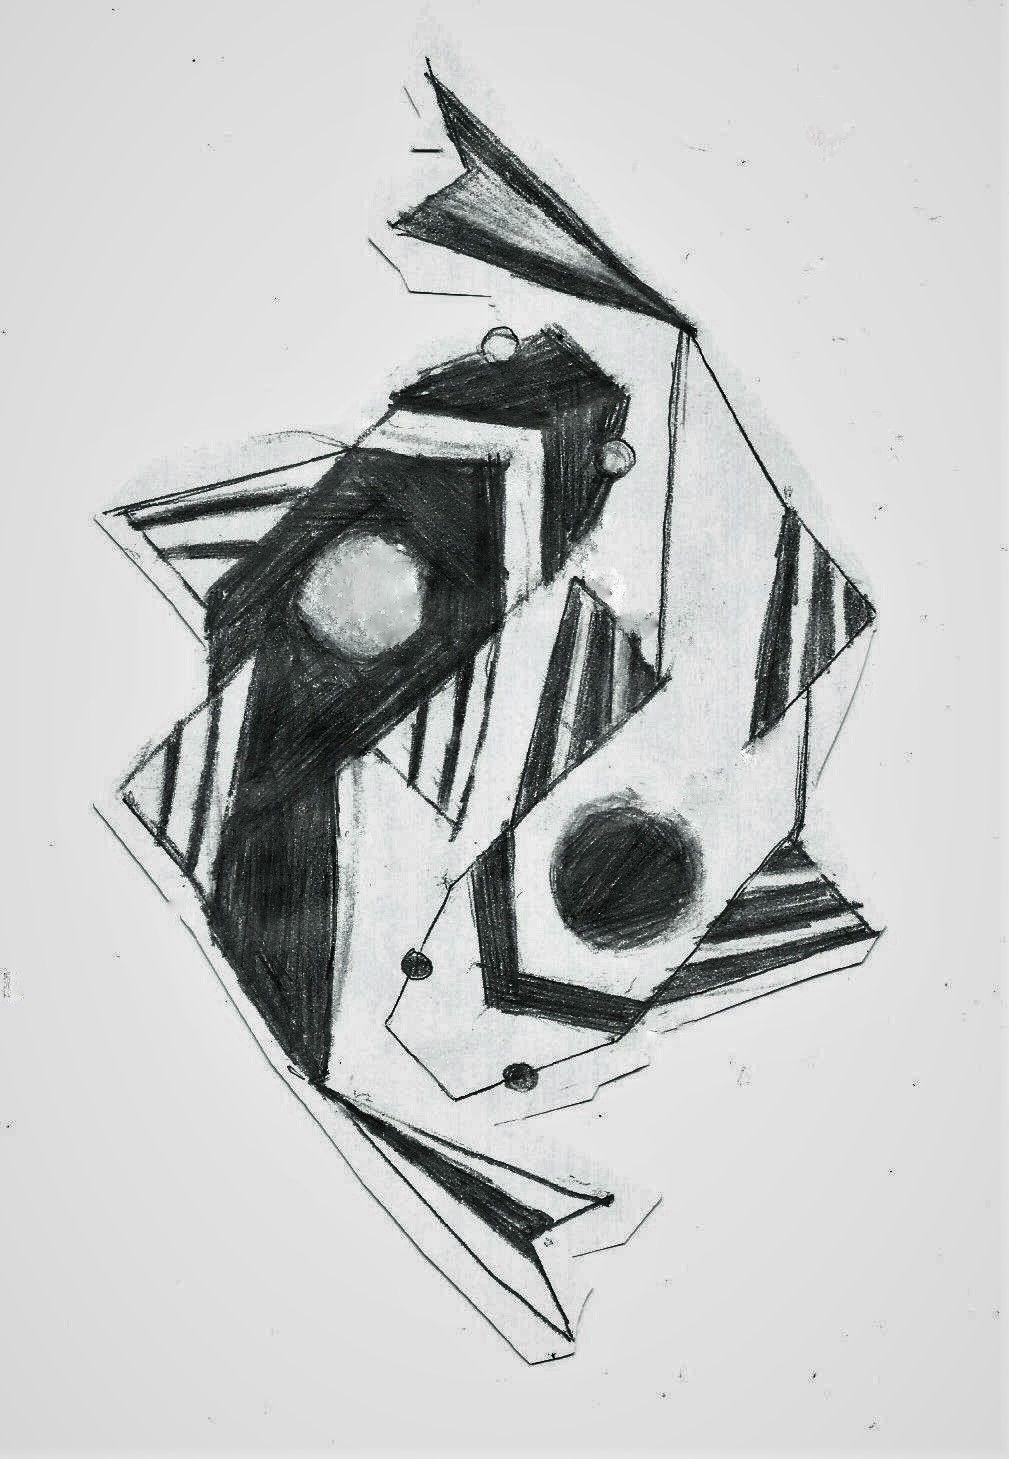 yin #yang #yinyang #fish #fishs #pisces #pencil #drawing #sketch ...